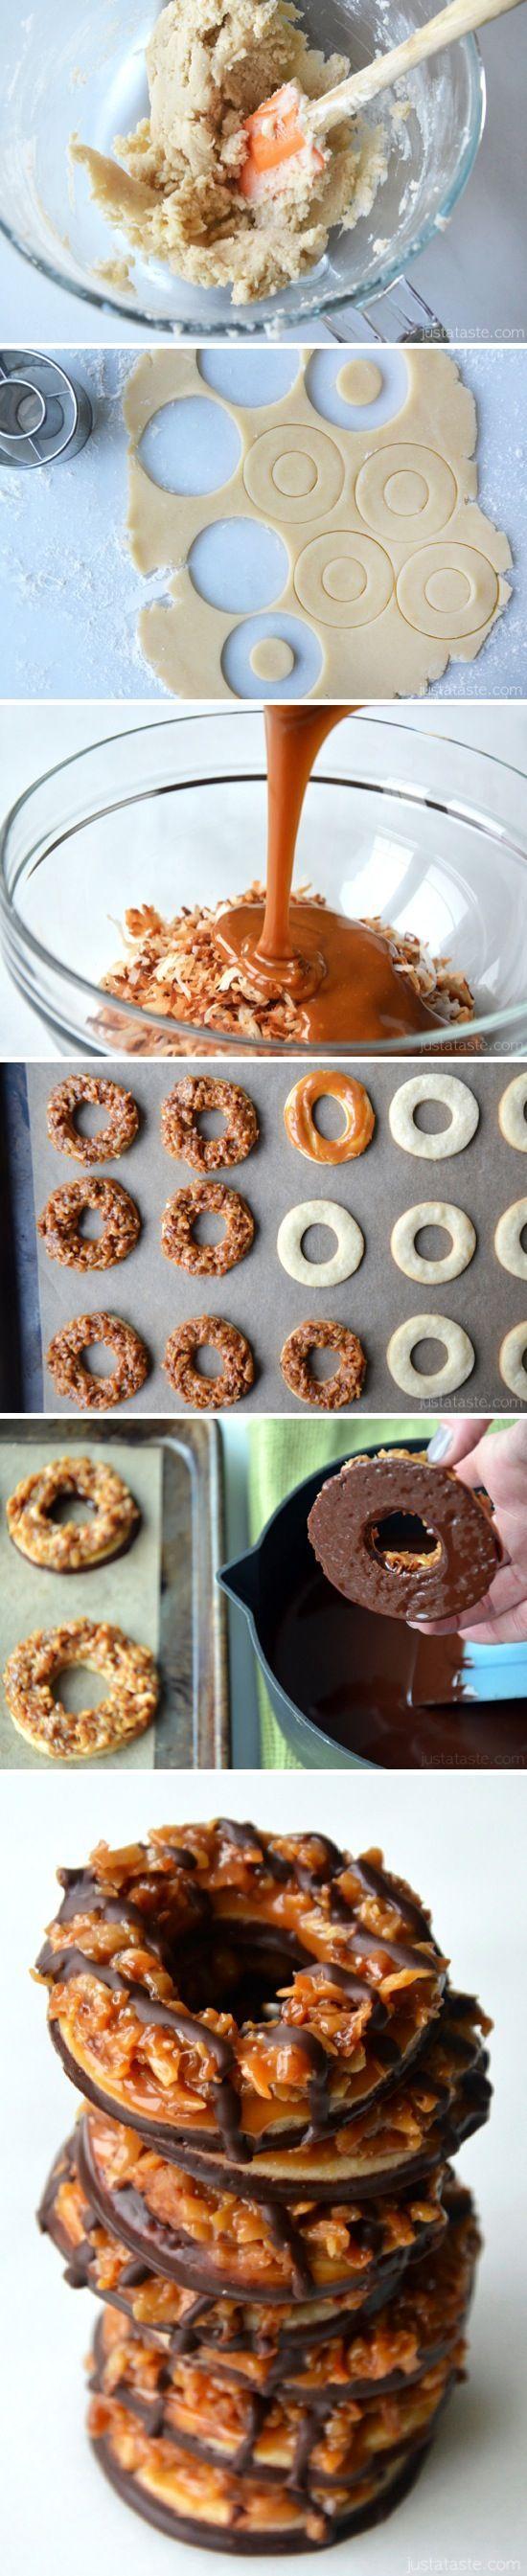 Homemade Samoa Girl Scout Cookies recipe